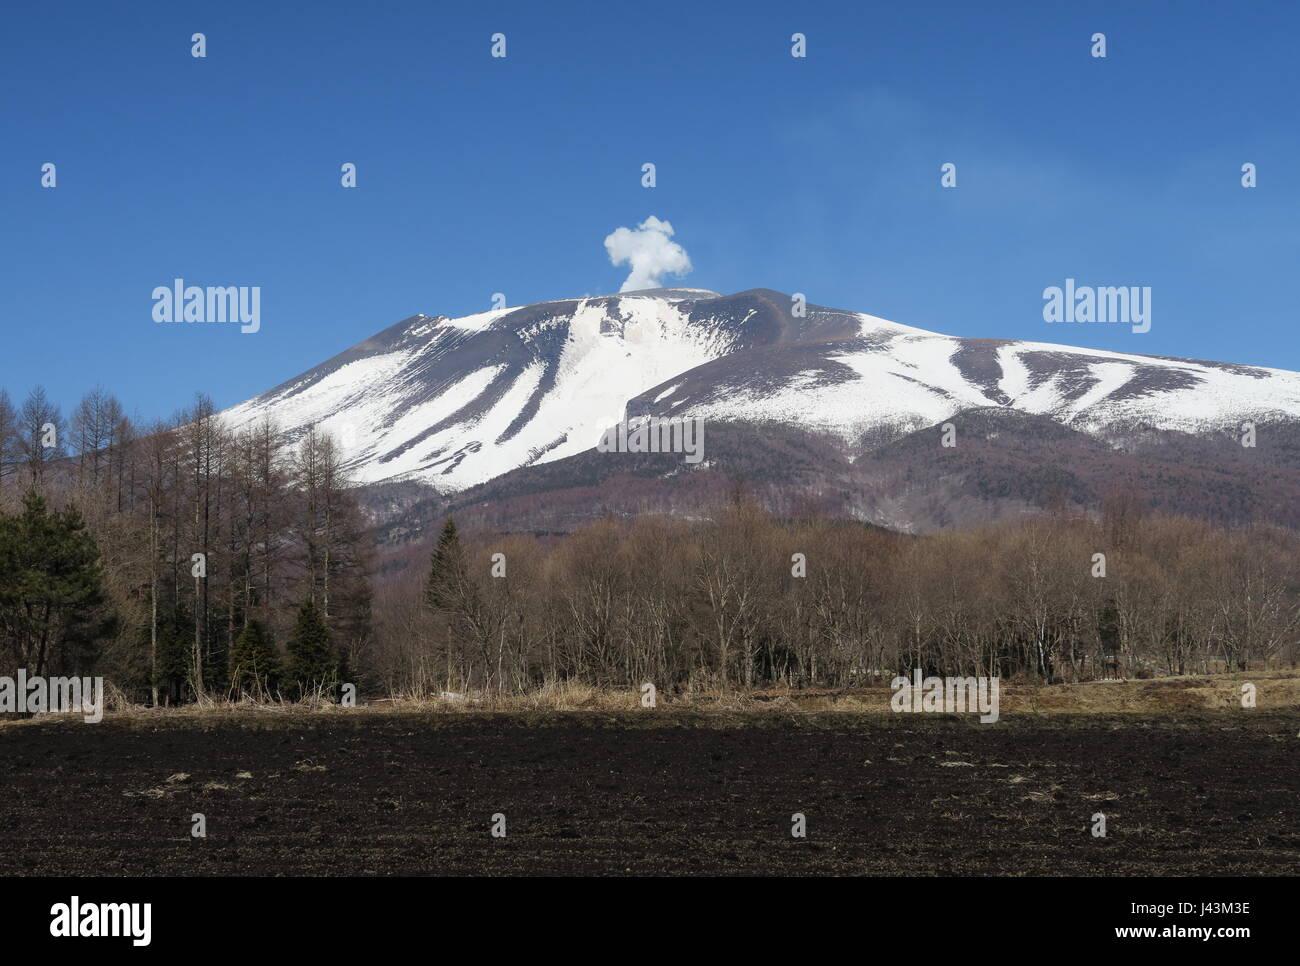 steam venting from vulcano  Karuizawa, Nagano Prefecture, Japan        February - Stock Image